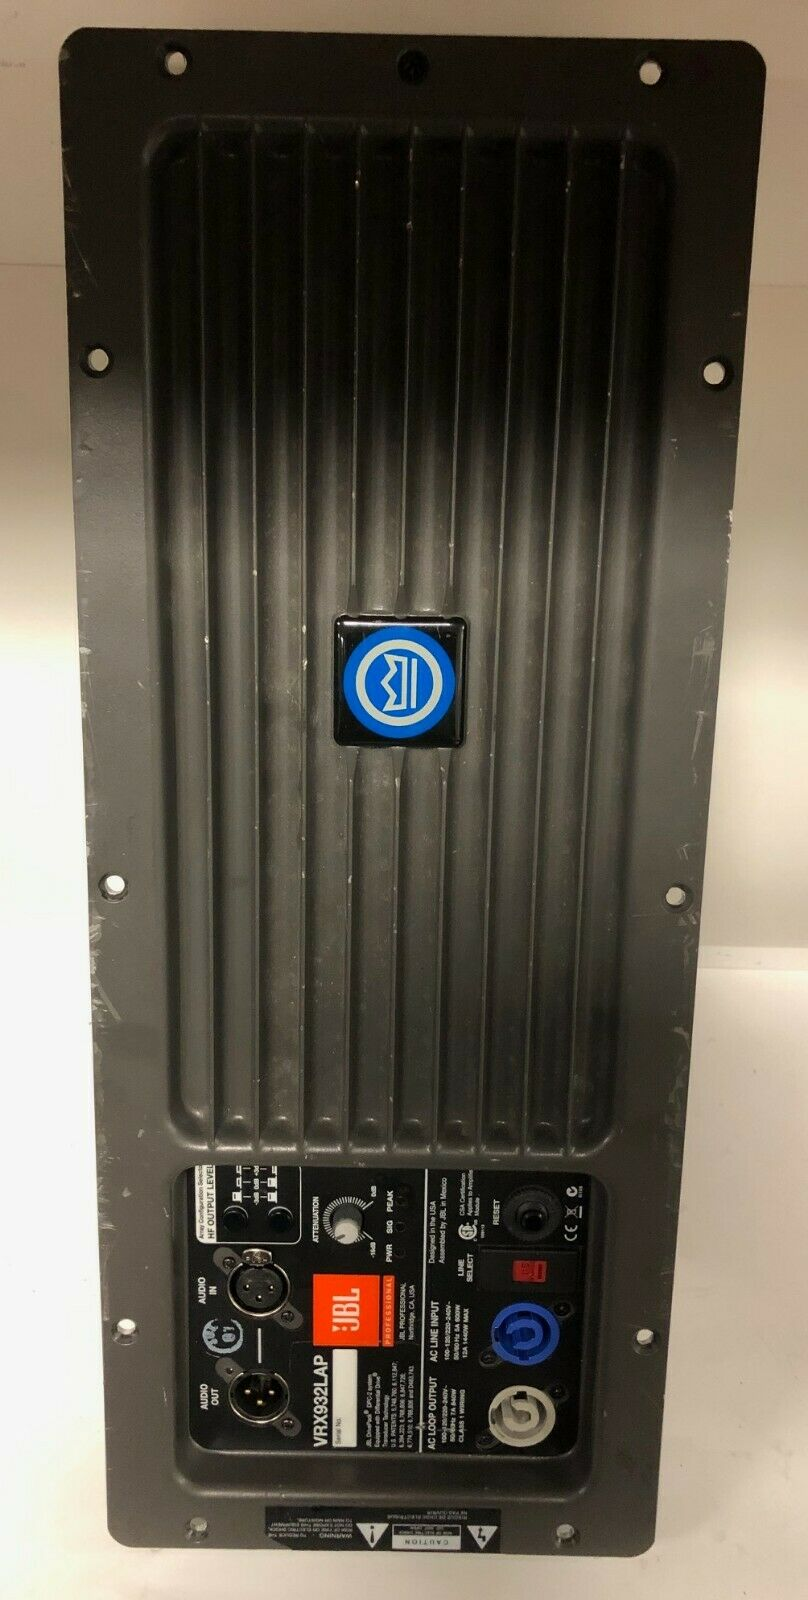 JBL VRX932LAP 1750 WATT POWErot FACTORY REPLACEMENT AMP MODULE (USED)